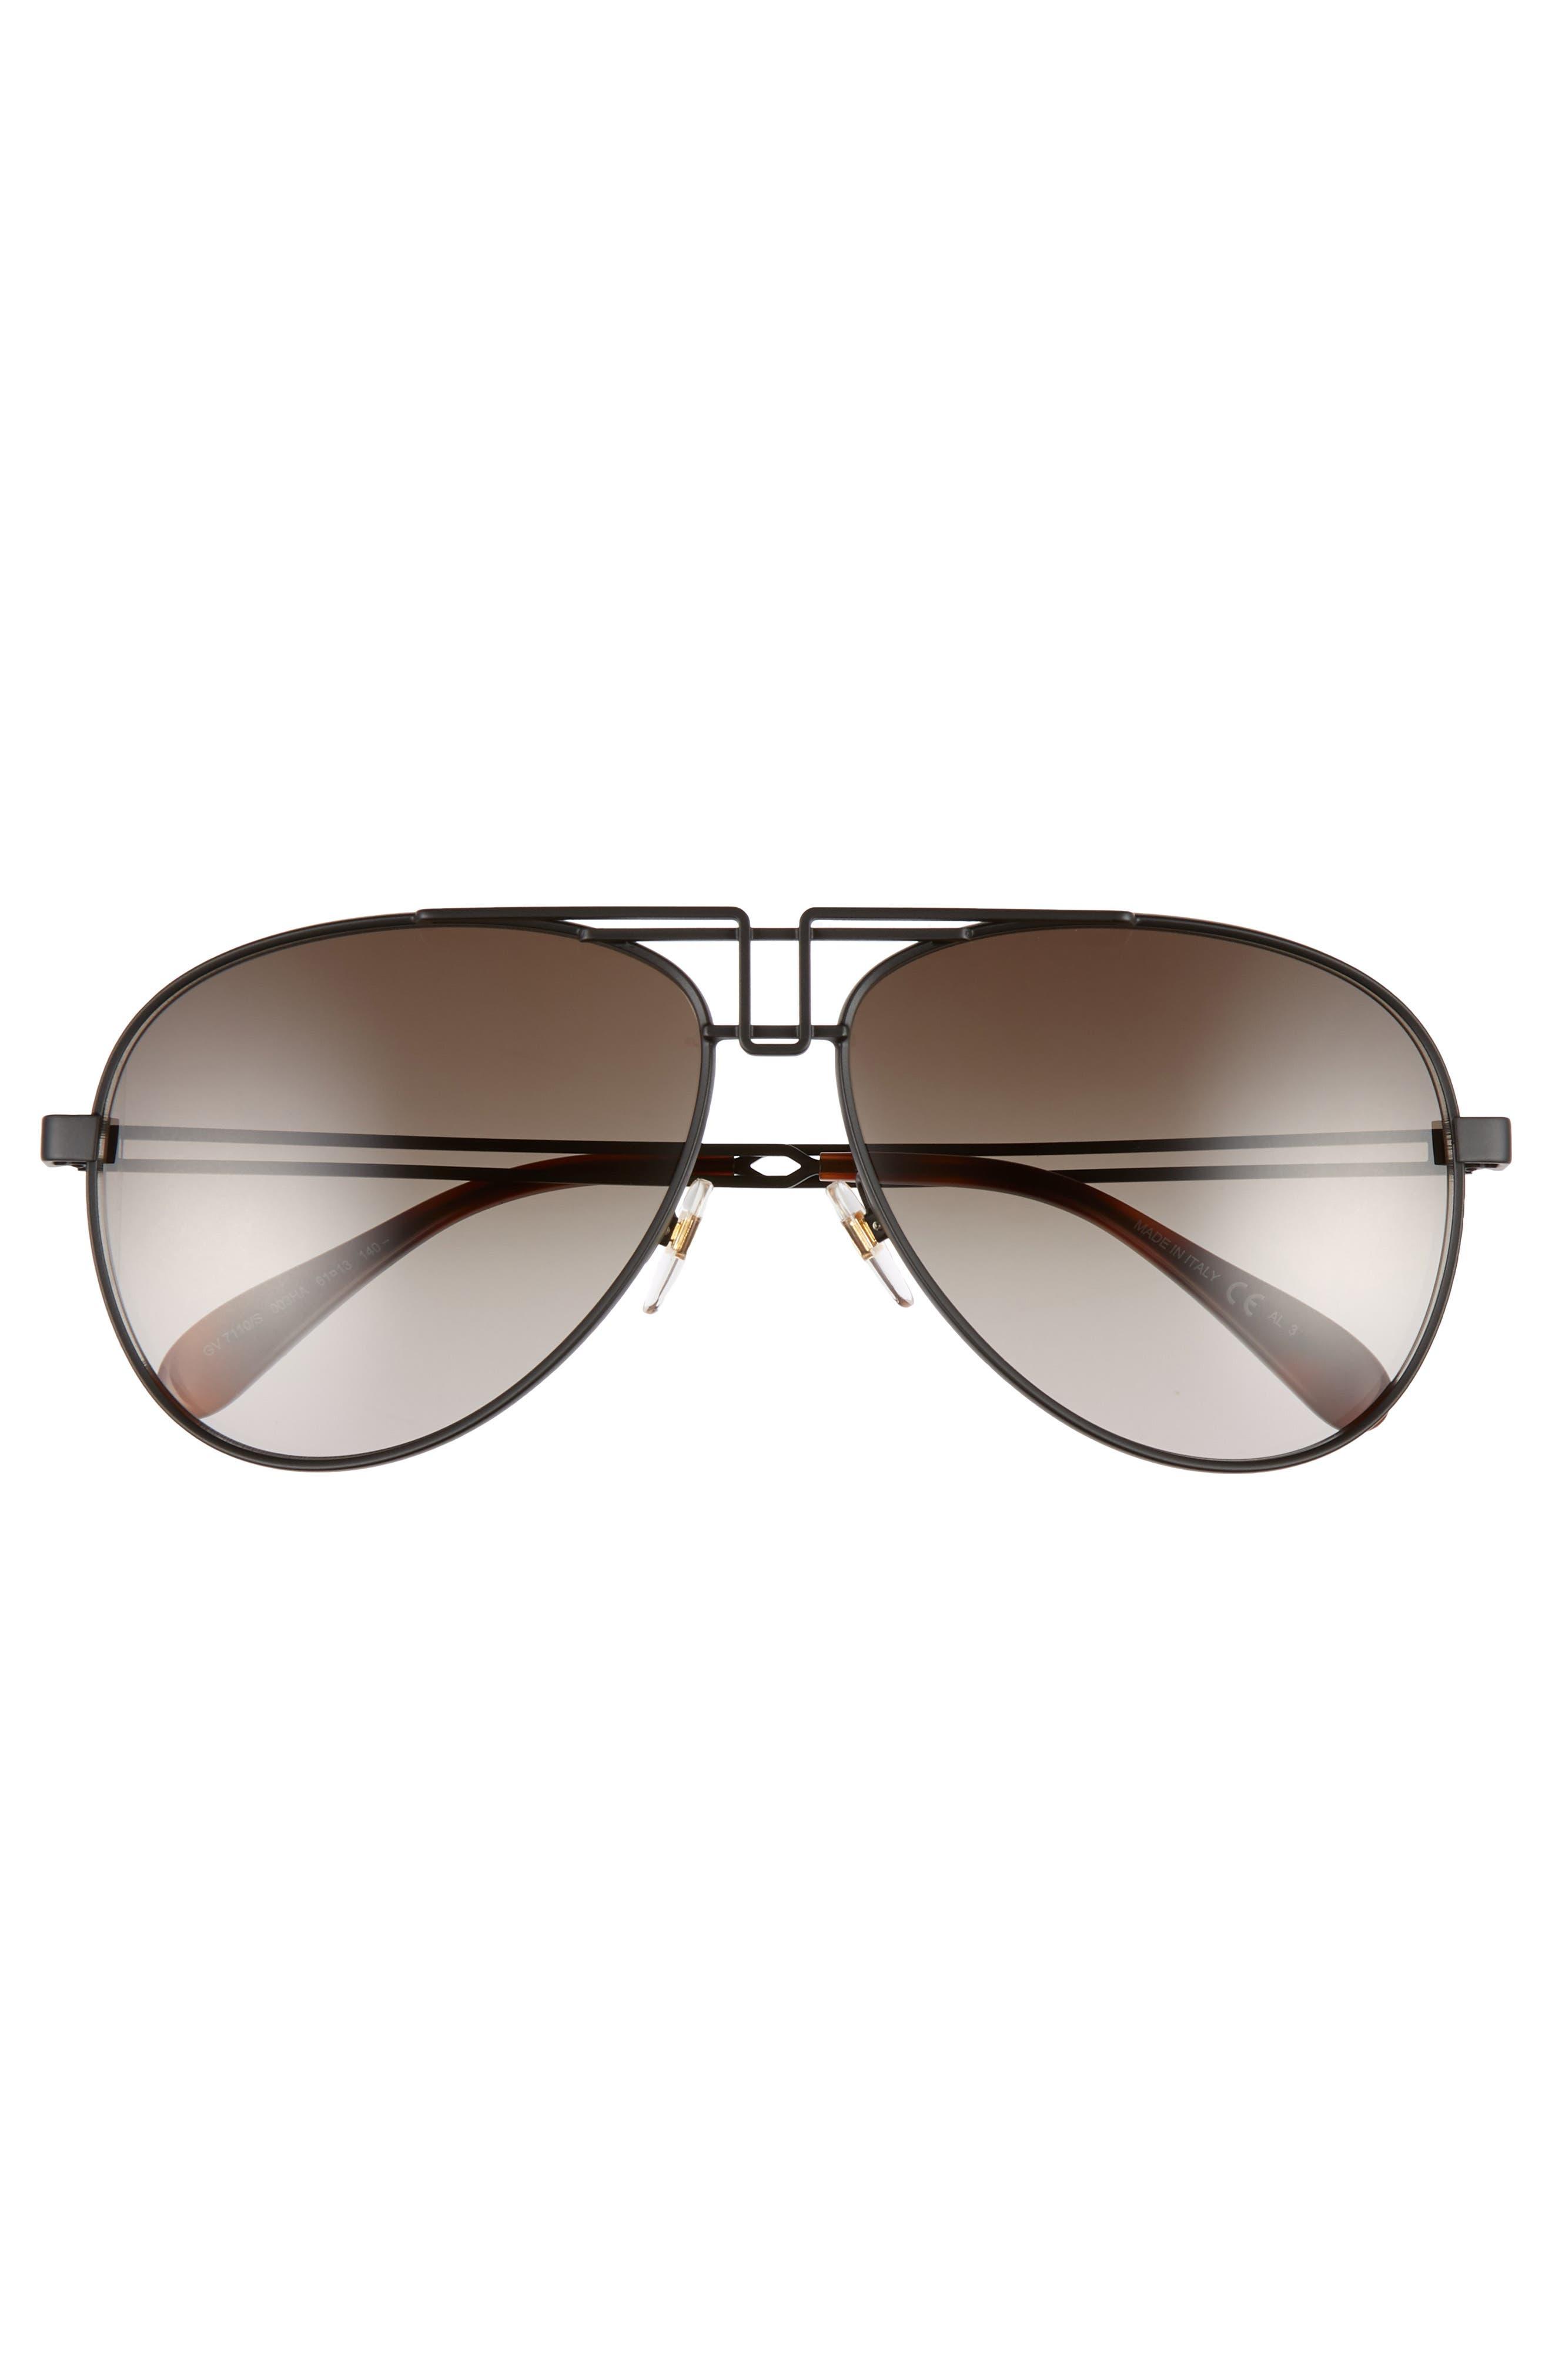 61mm Aviator Sunglasses,                             Alternate thumbnail 3, color,                             MATTE BLACK